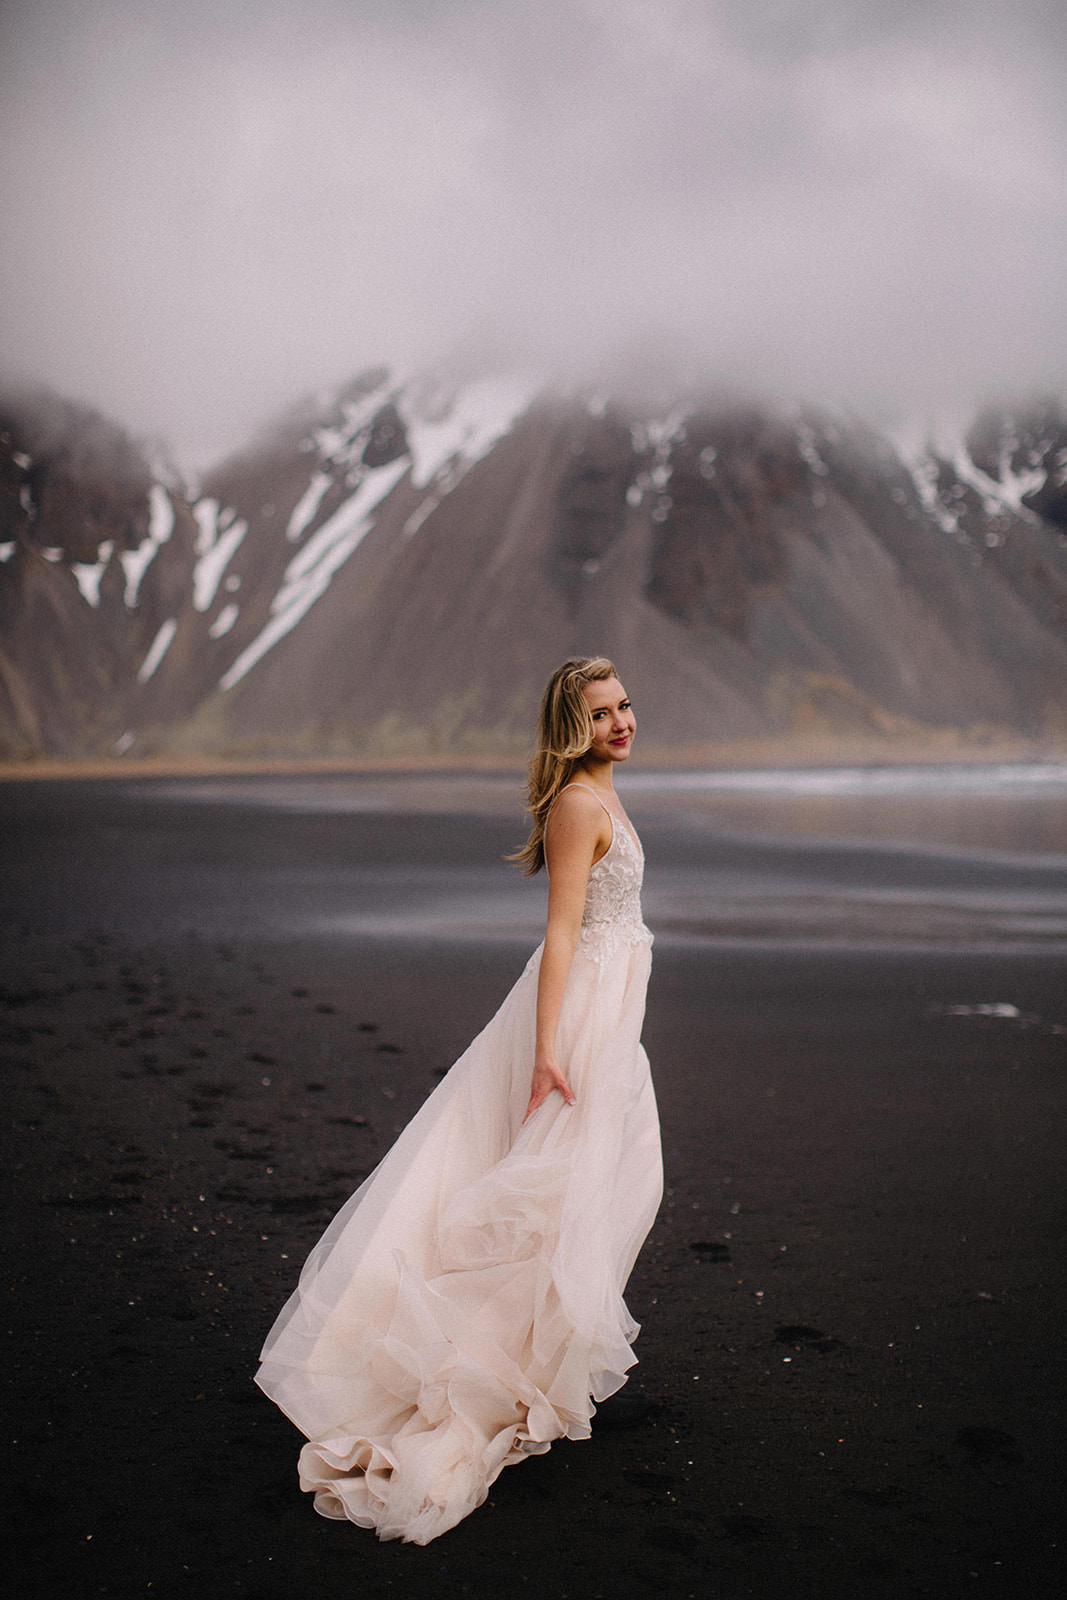 Icelandic Iceland Elopement Wedding Elope Photographer Eloping Reykjavík Vik Black Sand Beach Jökulsárlón Skogafoss Waterfall Vestrahorn Mountain Liz Osban Photography Destination 42.jpg